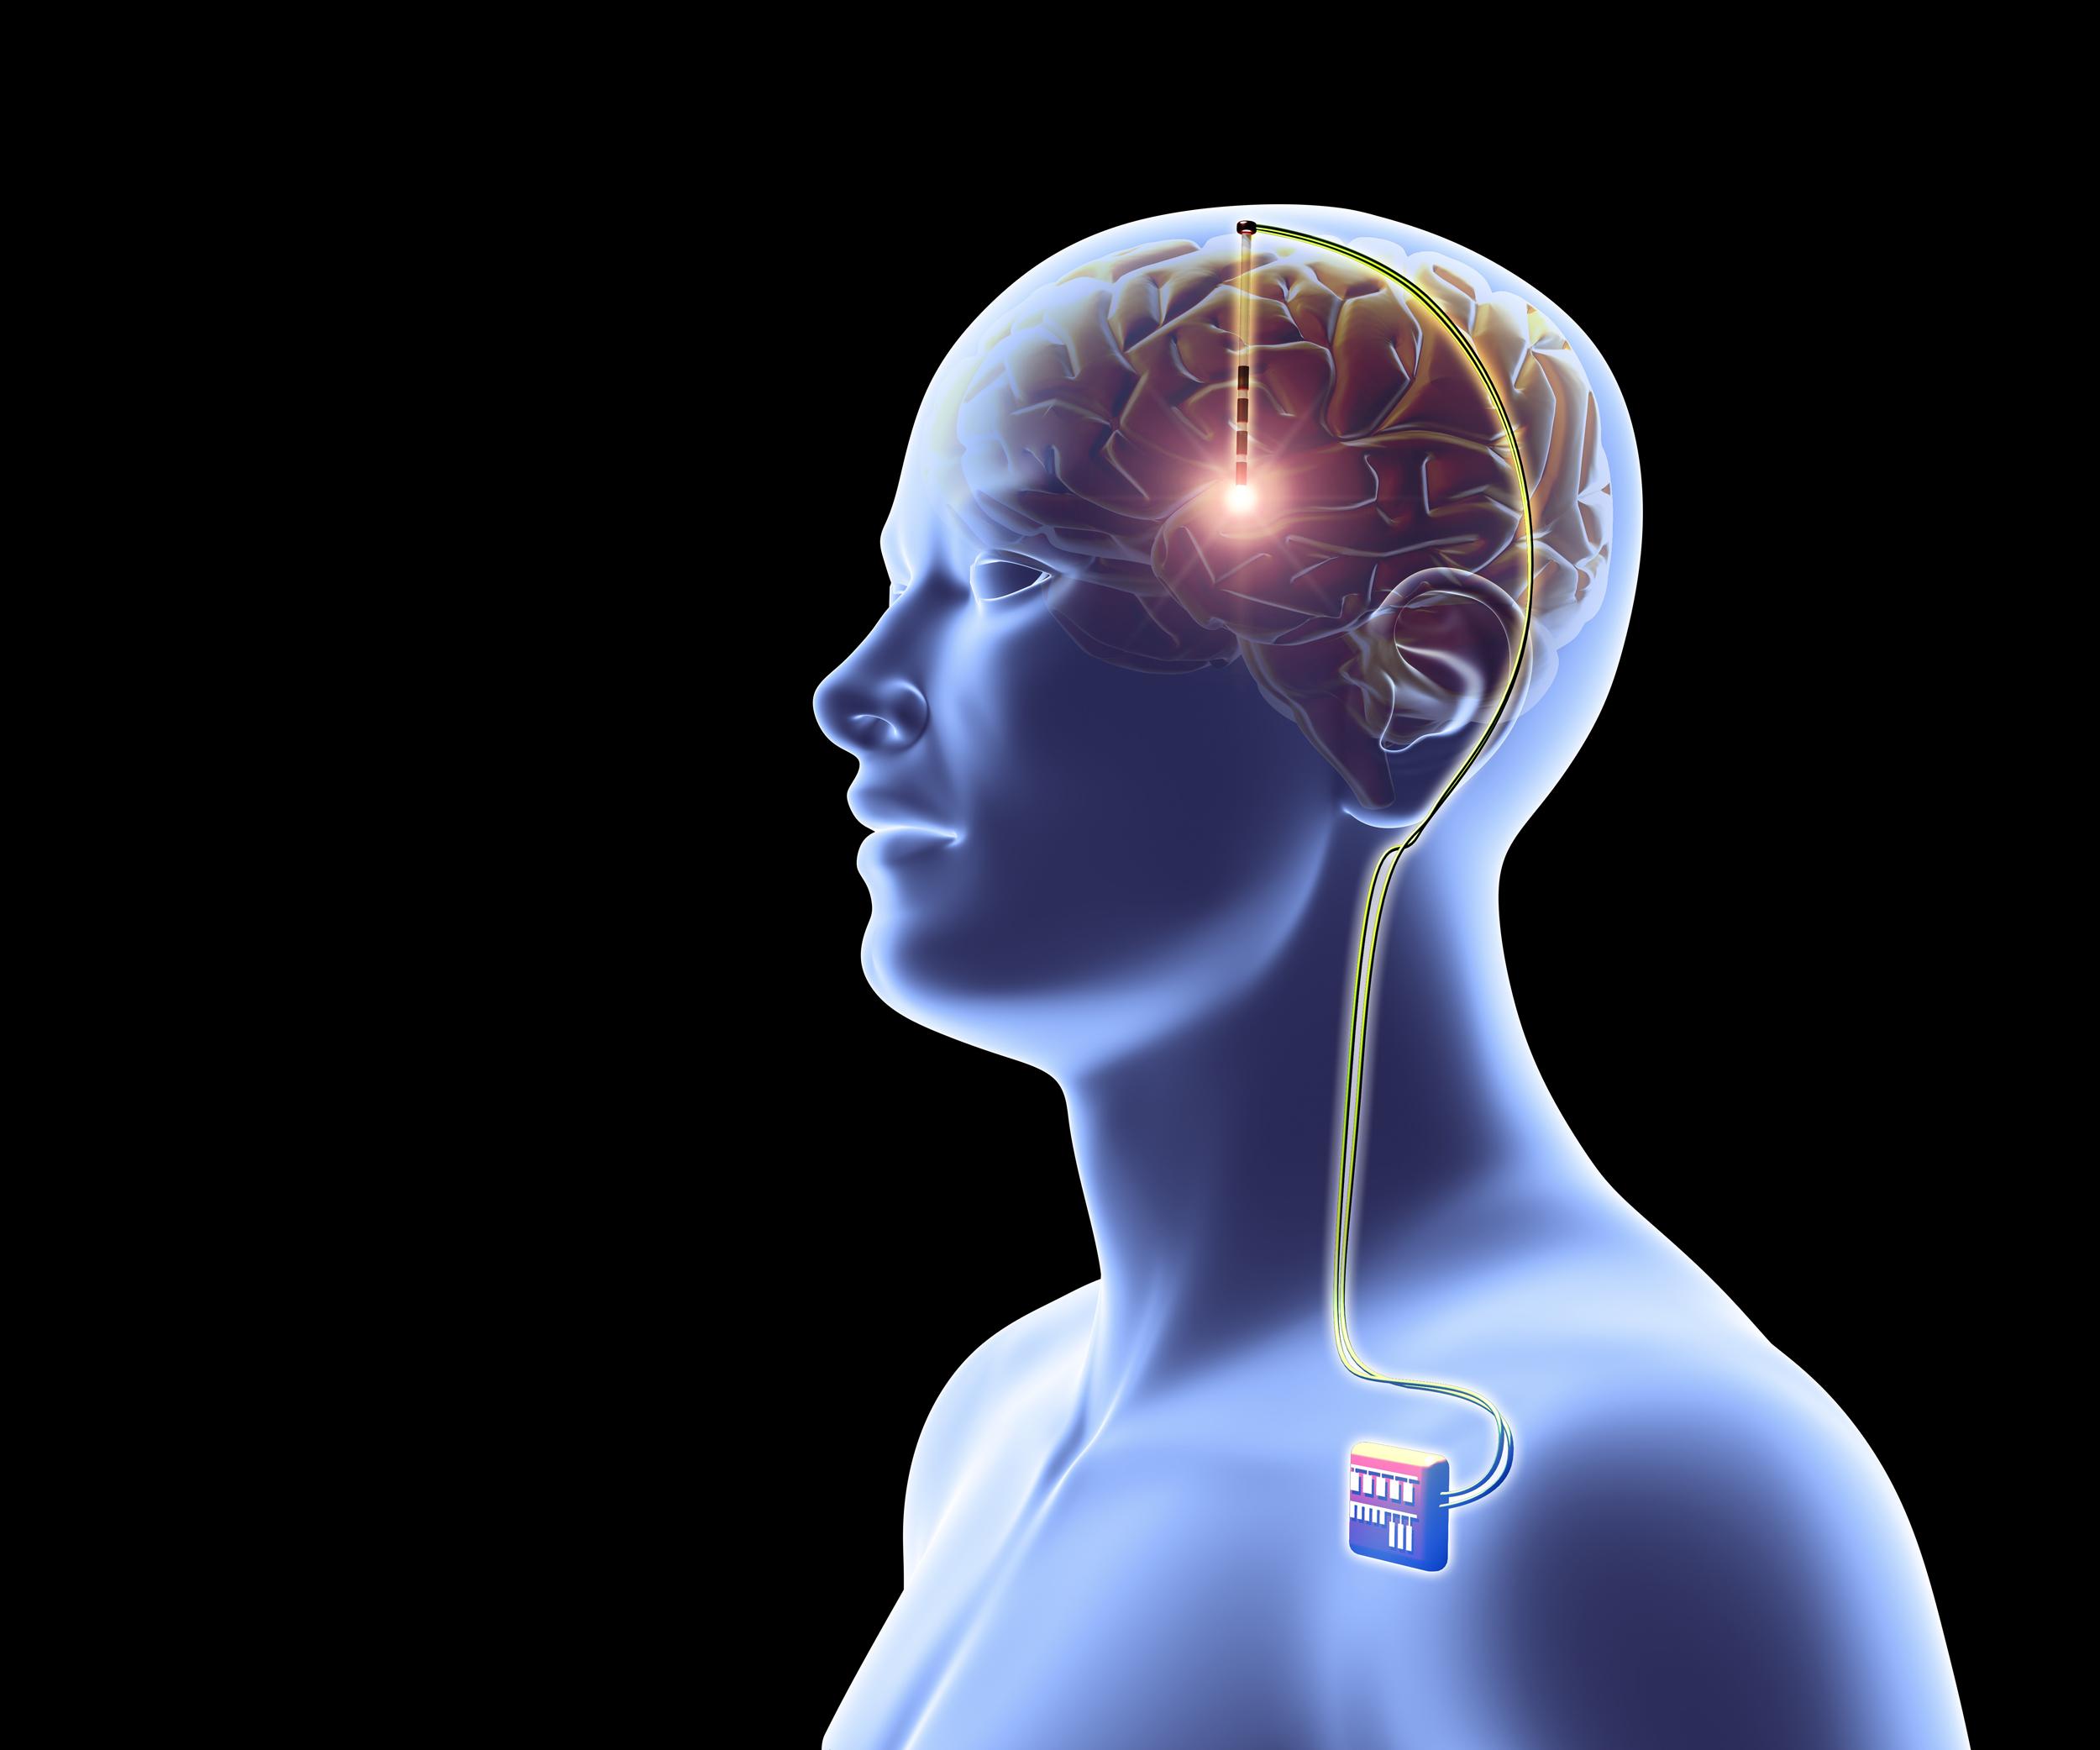 brain wiring test scoring wiring solutions rh rausco com Wiring the Brain of Personality Disorder Female Brain Wiring